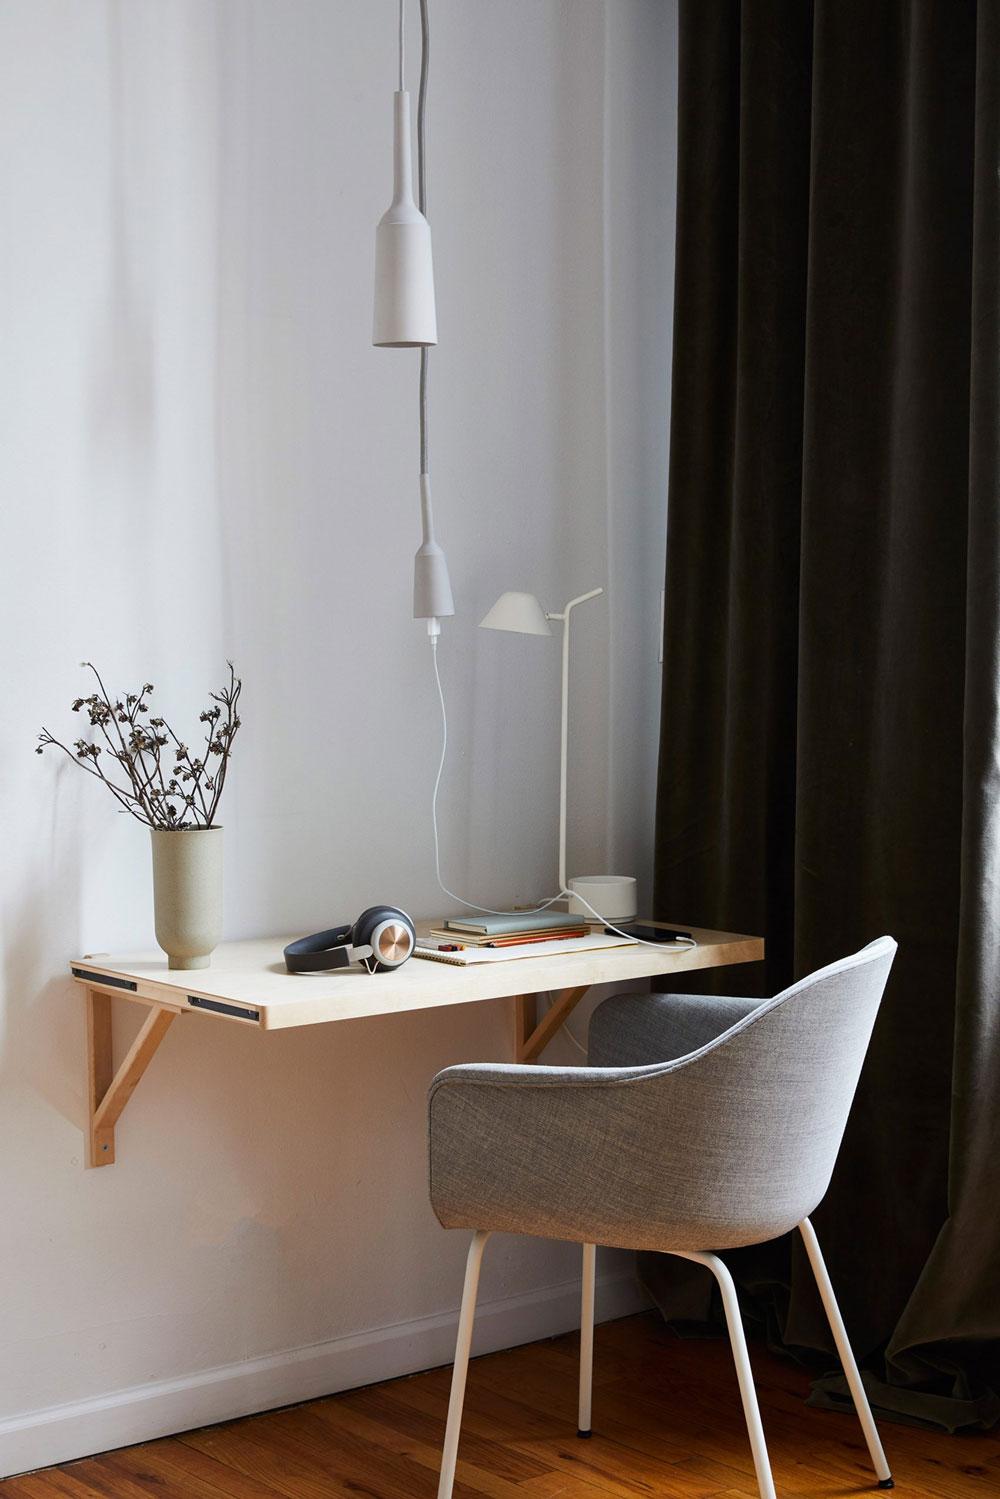 Danish brand menu opens showroom in new york city nordicdesign for Interior designers in new york city